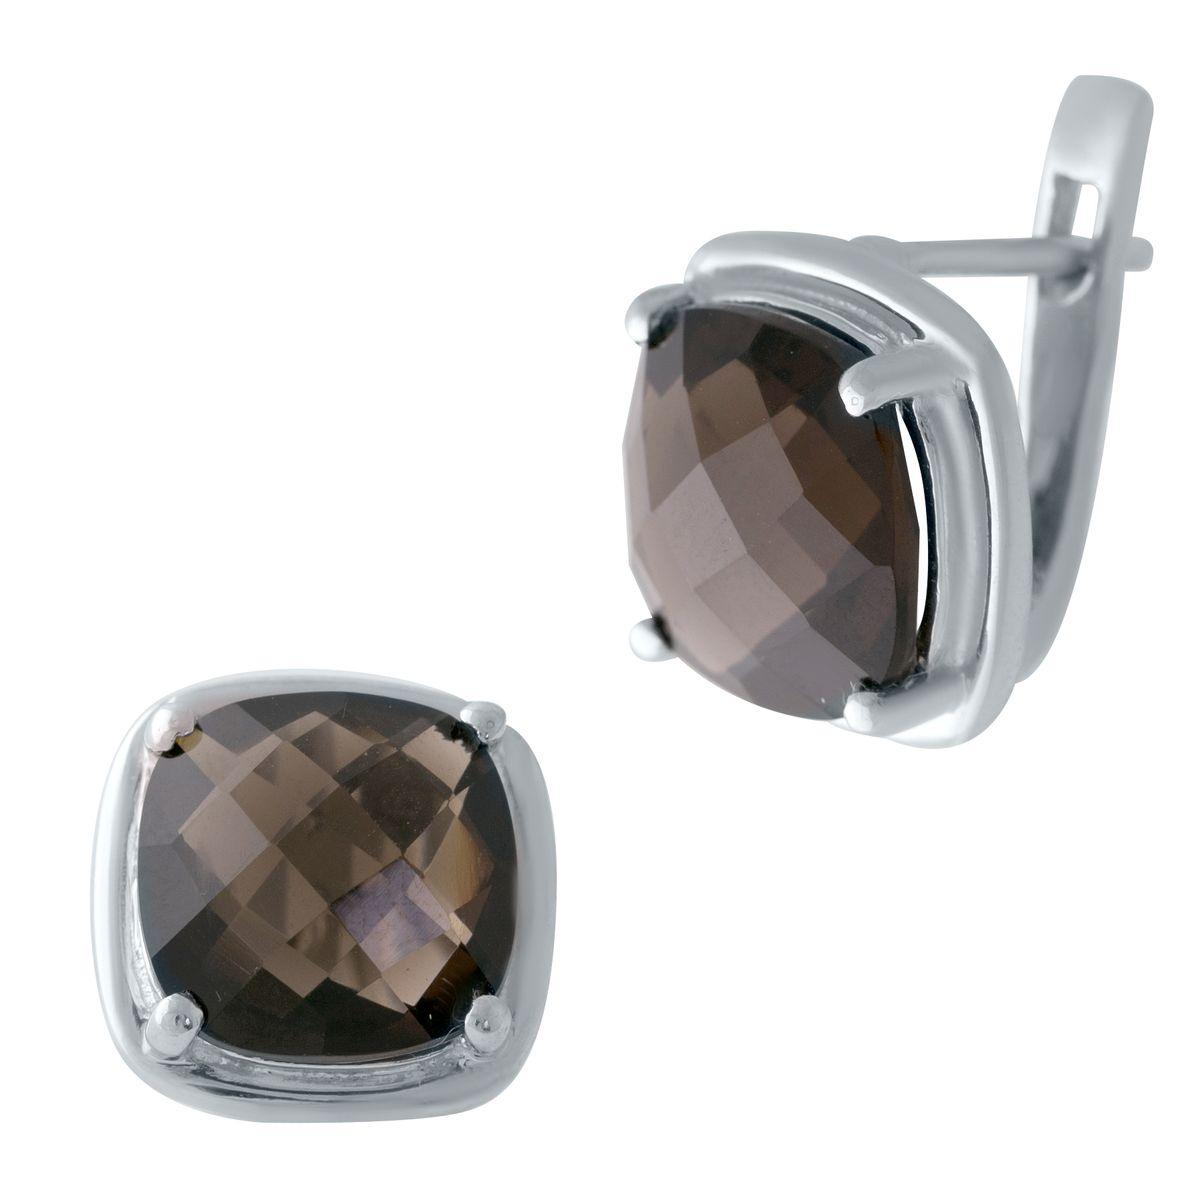 Серебряные серьги DreamJewelry с натуральным раухтопазом (димчатим кварцем) (2025382)